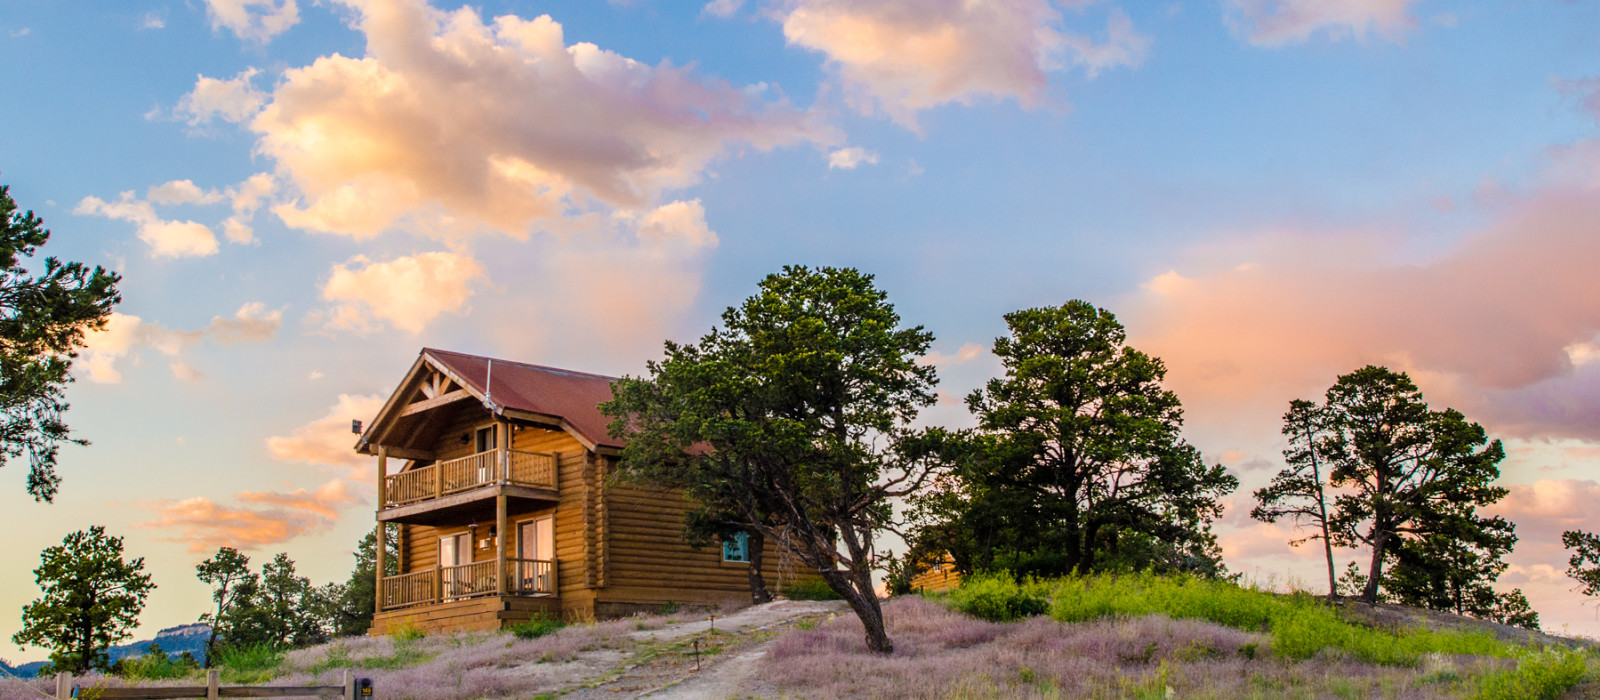 Hotel Zion Mountain Ranch USA